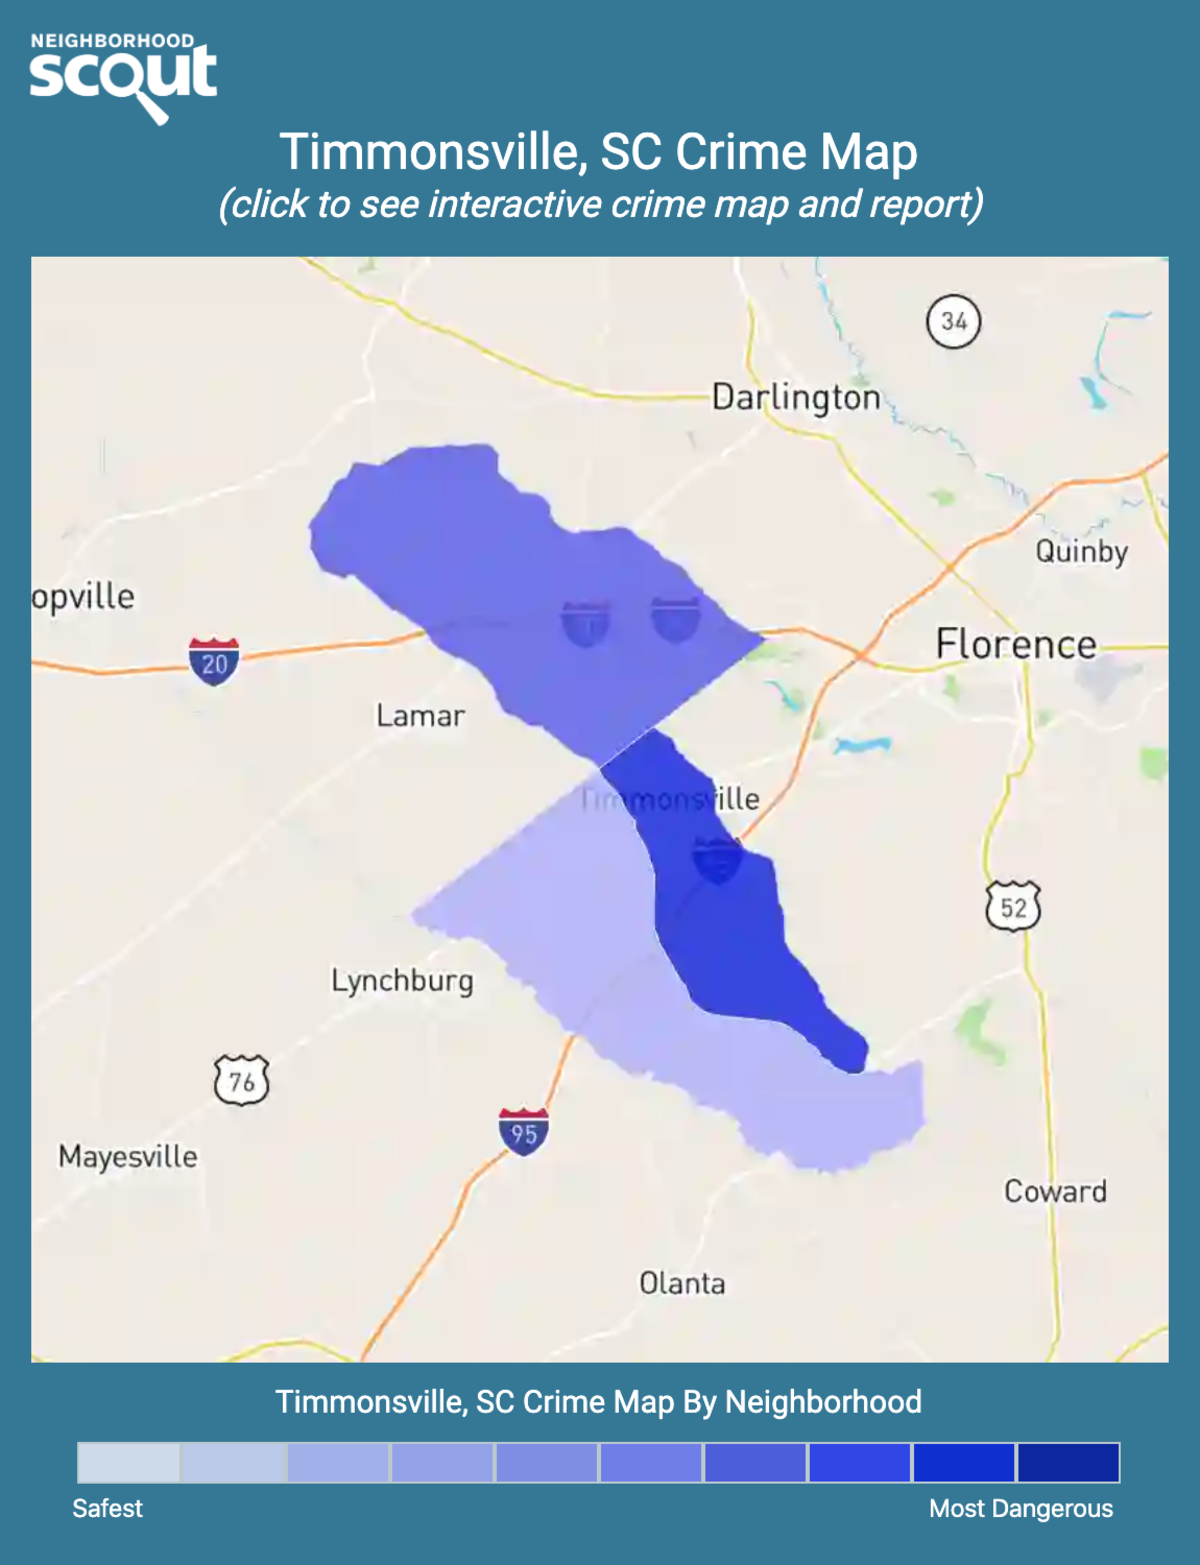 Timmonsville, South Carolina crime map